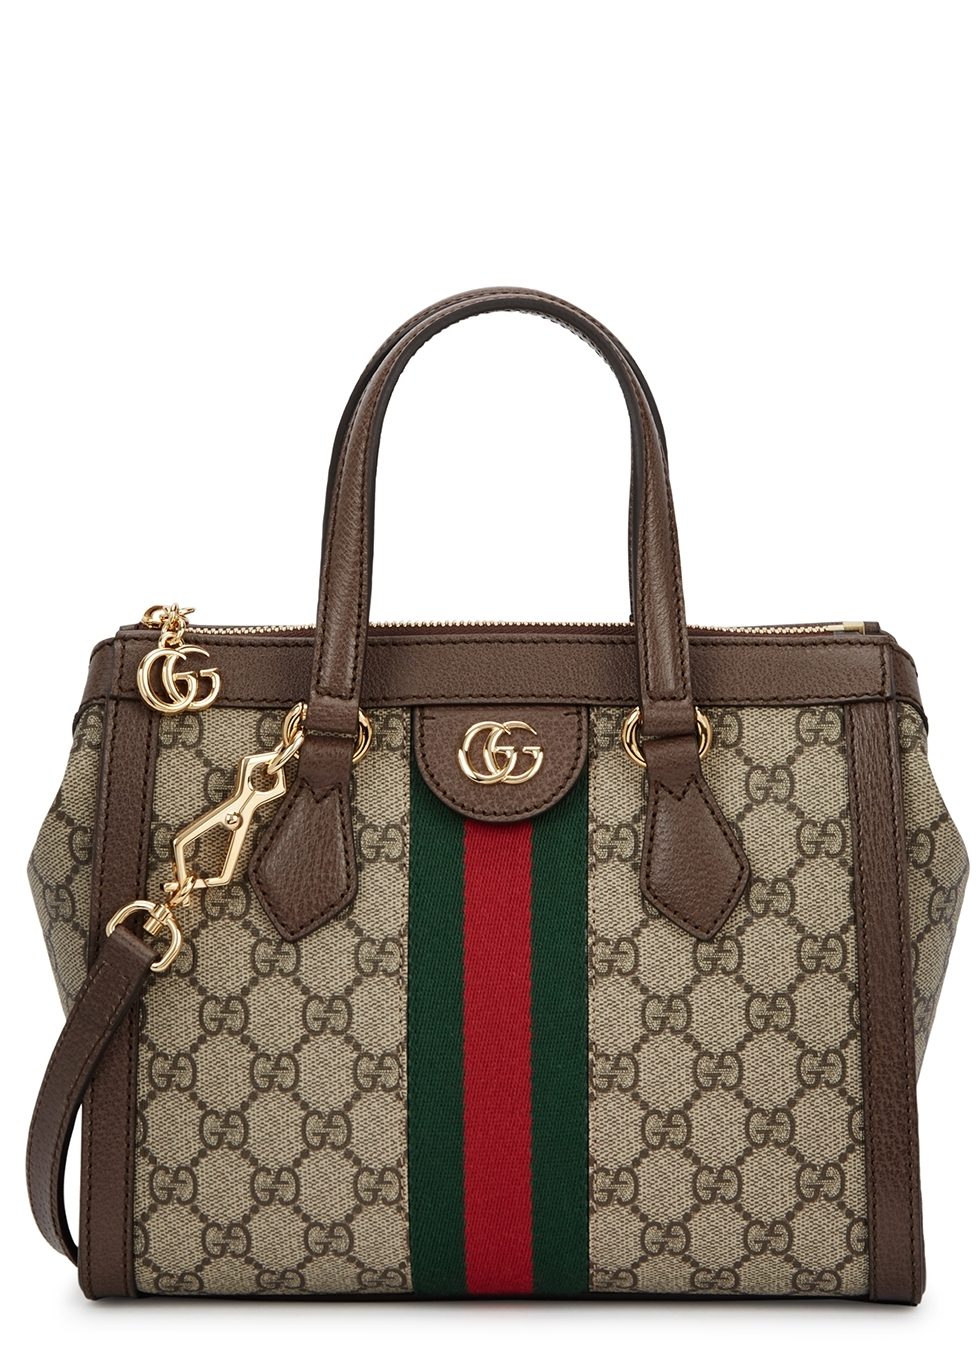 804a2be01632 Women s Designer Bags